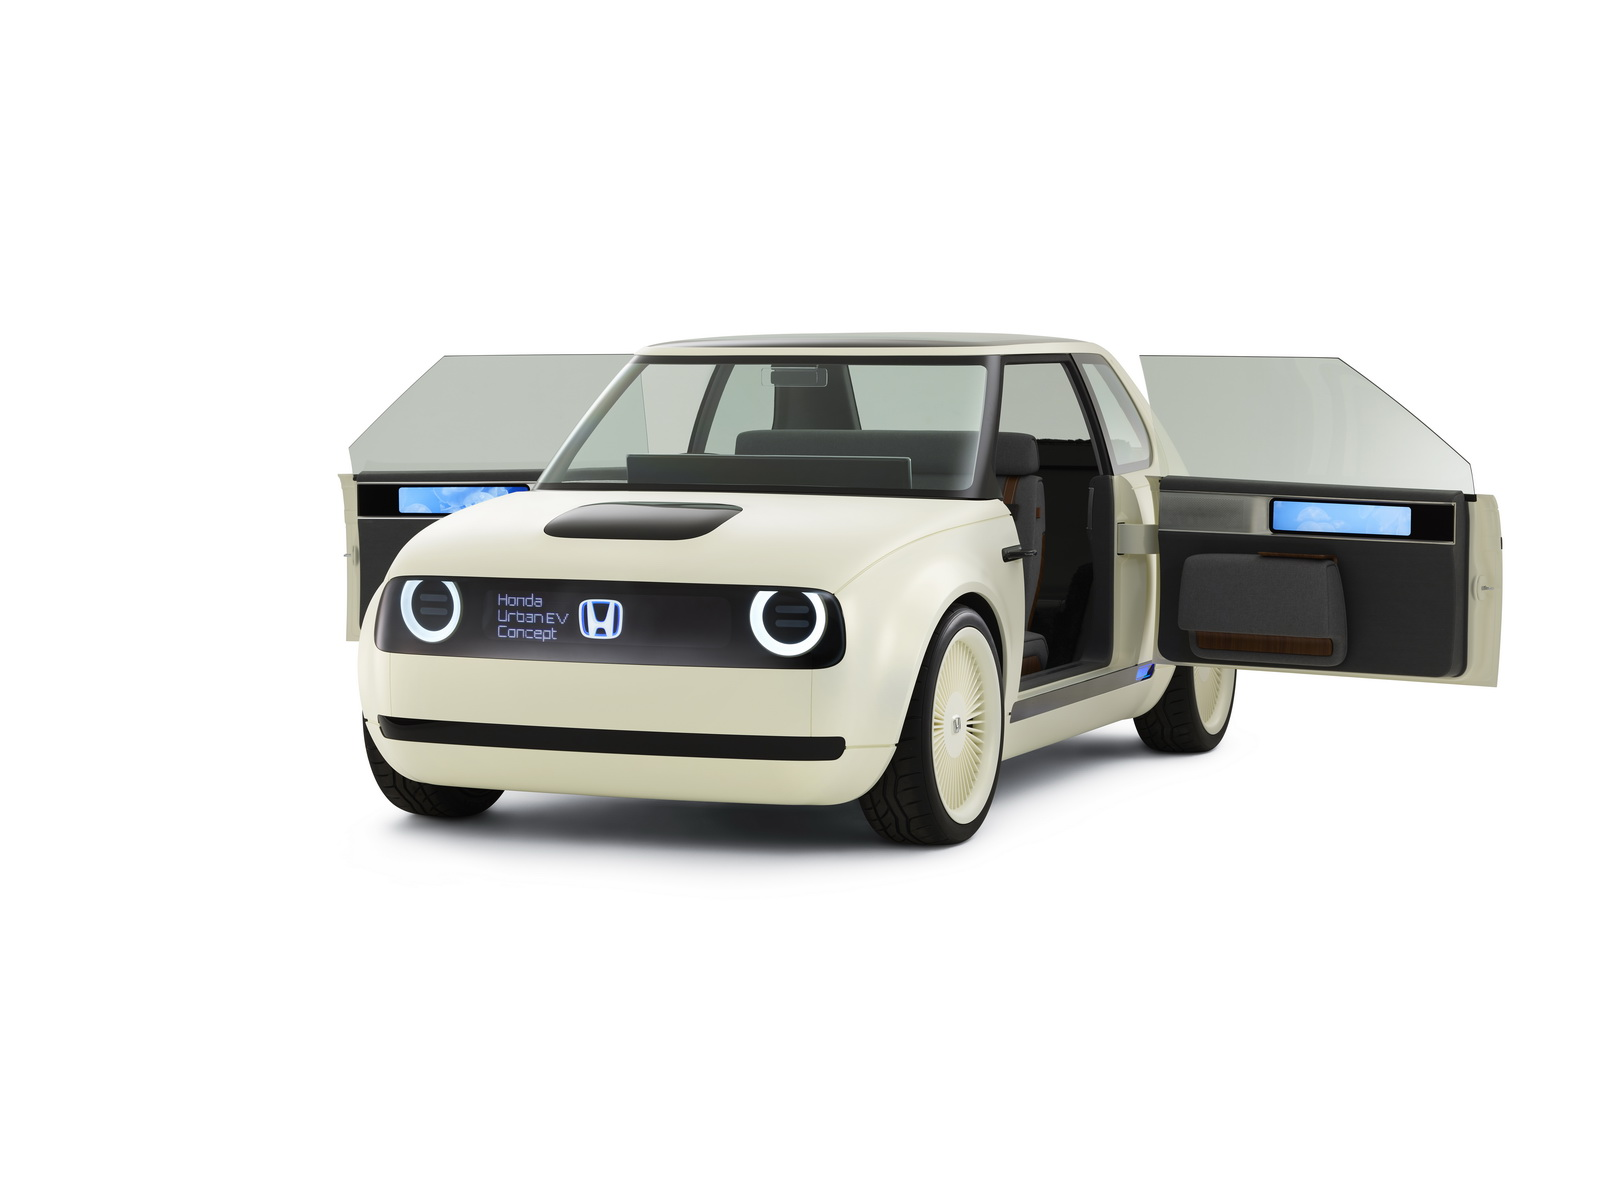 Honda_Urban_EV_Concept_03.jpg